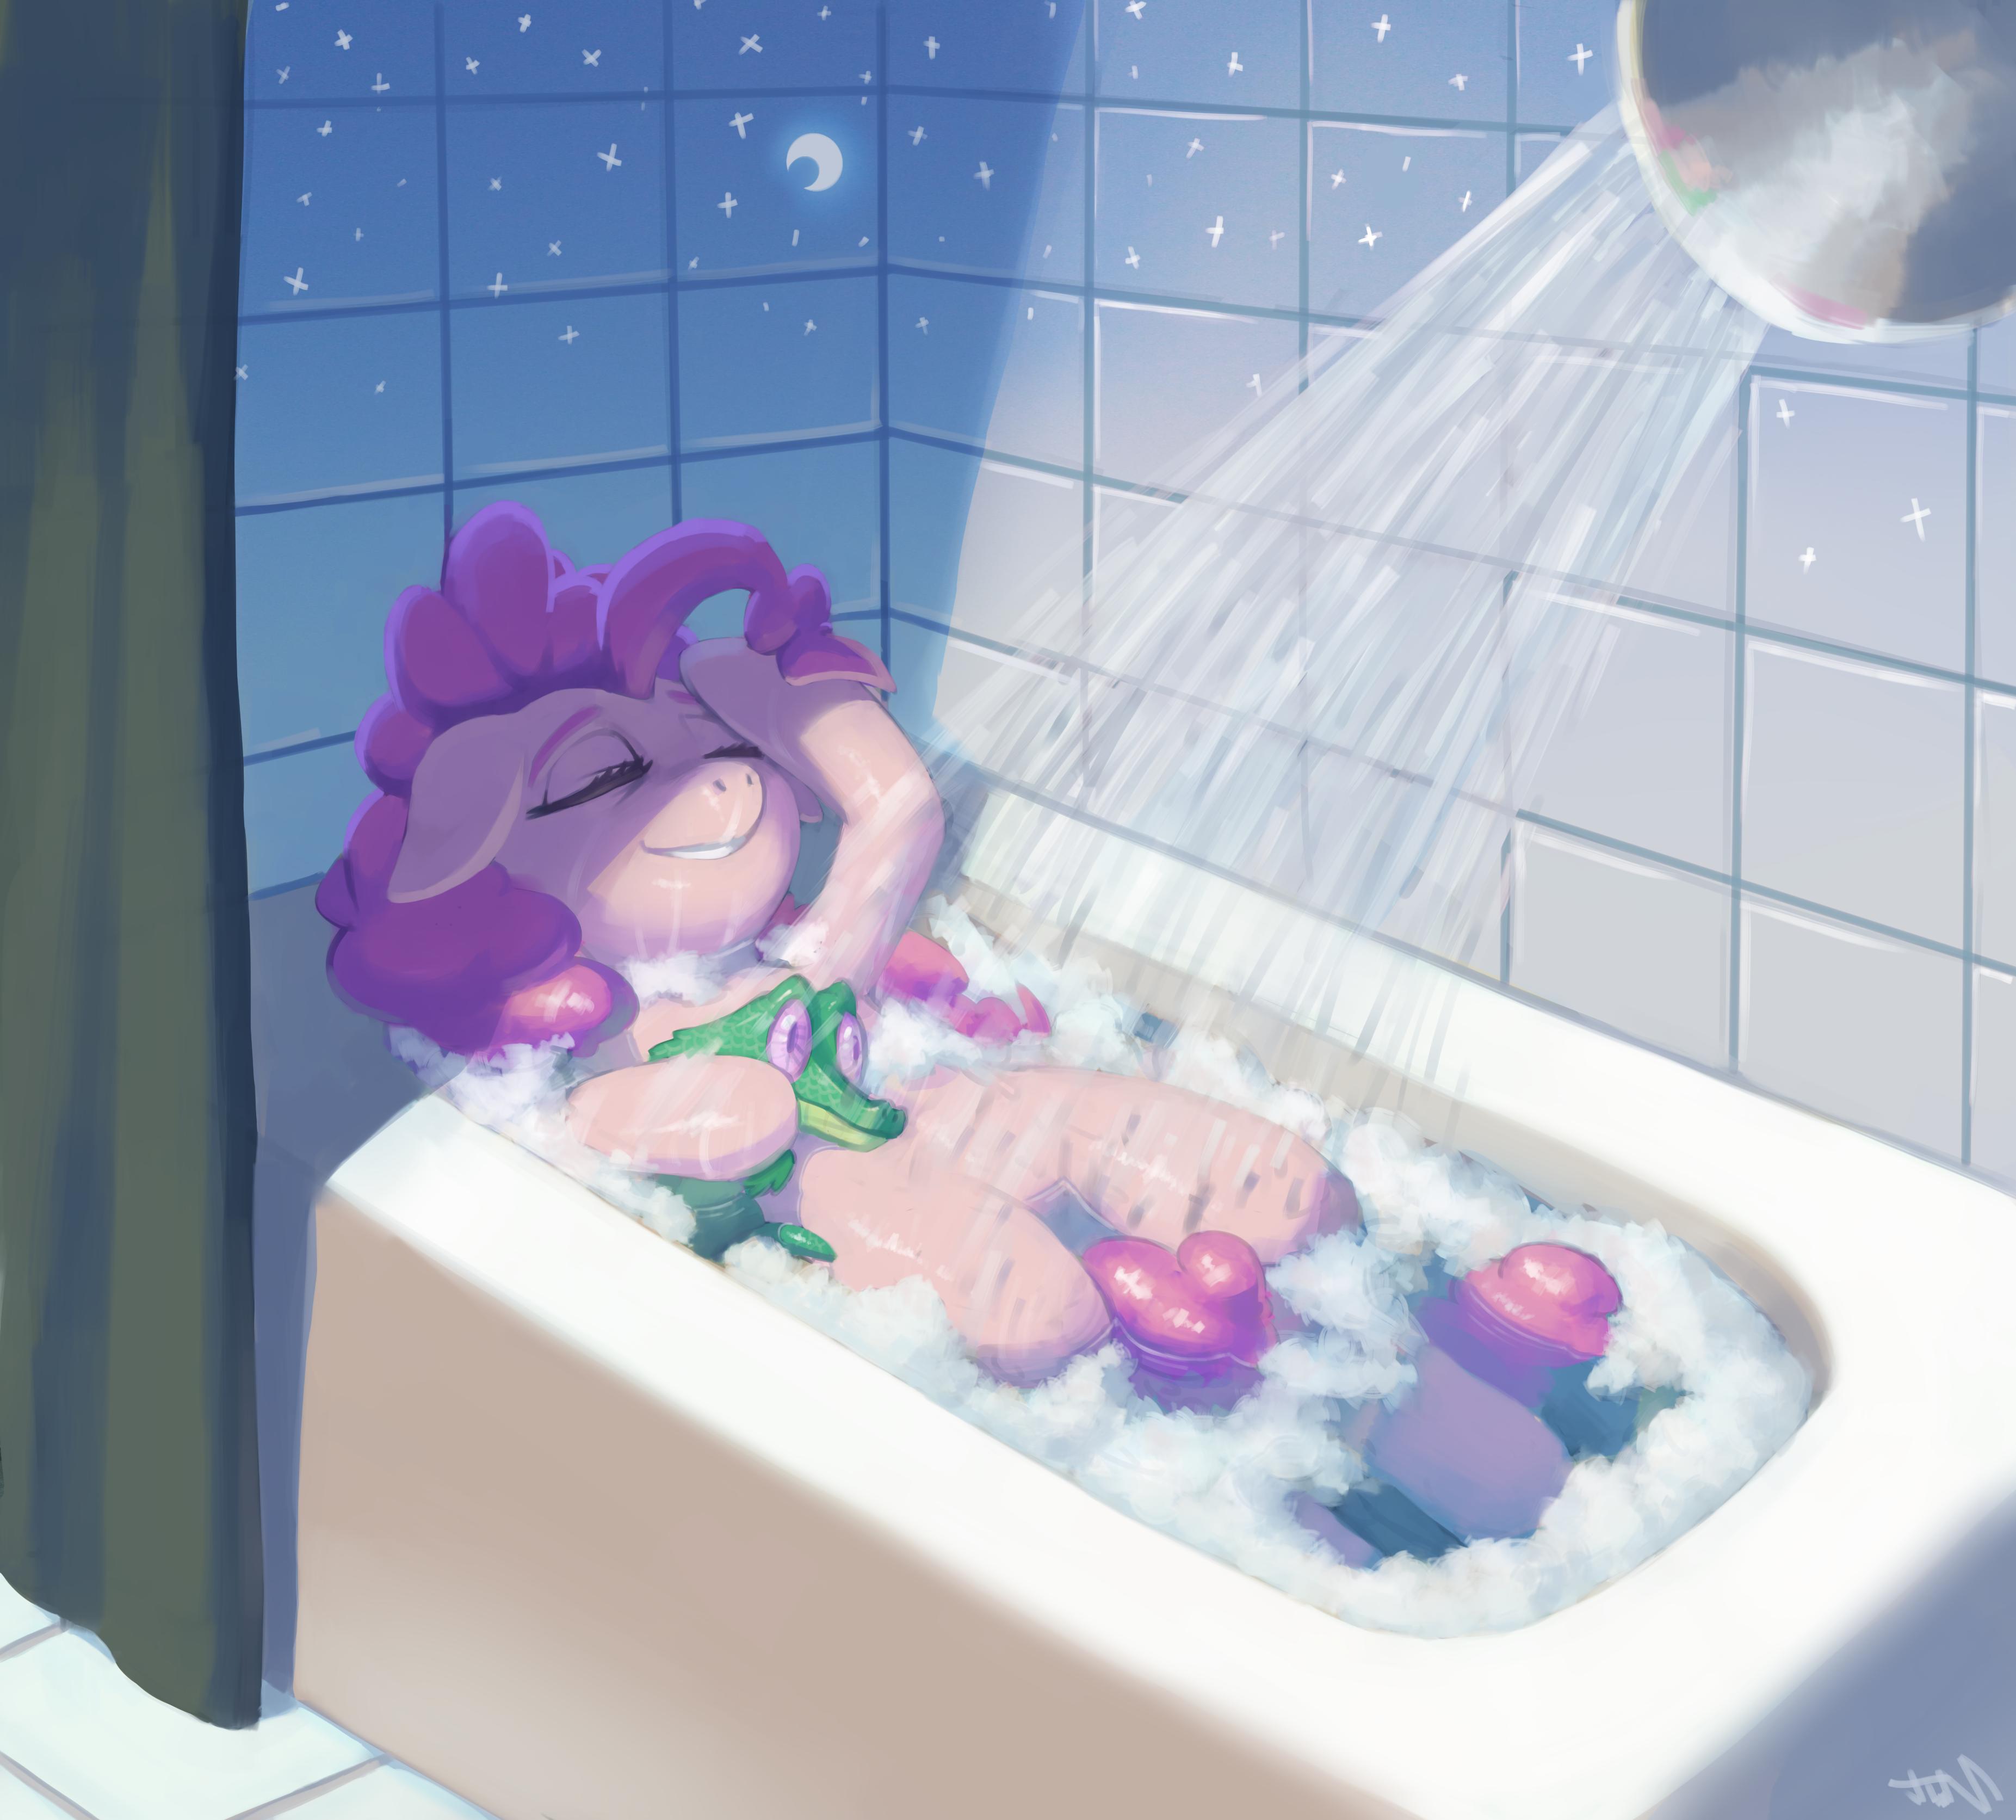 In the bathroom while taking a shower or a well deserved bubble bath -  1250161 Artist Ligerstorm Bath Bathroom Bathtub Bubble Bath Gummy Moon Pinkie Pie Safe Shower Stars Derpibooru My Little Pony Friendship